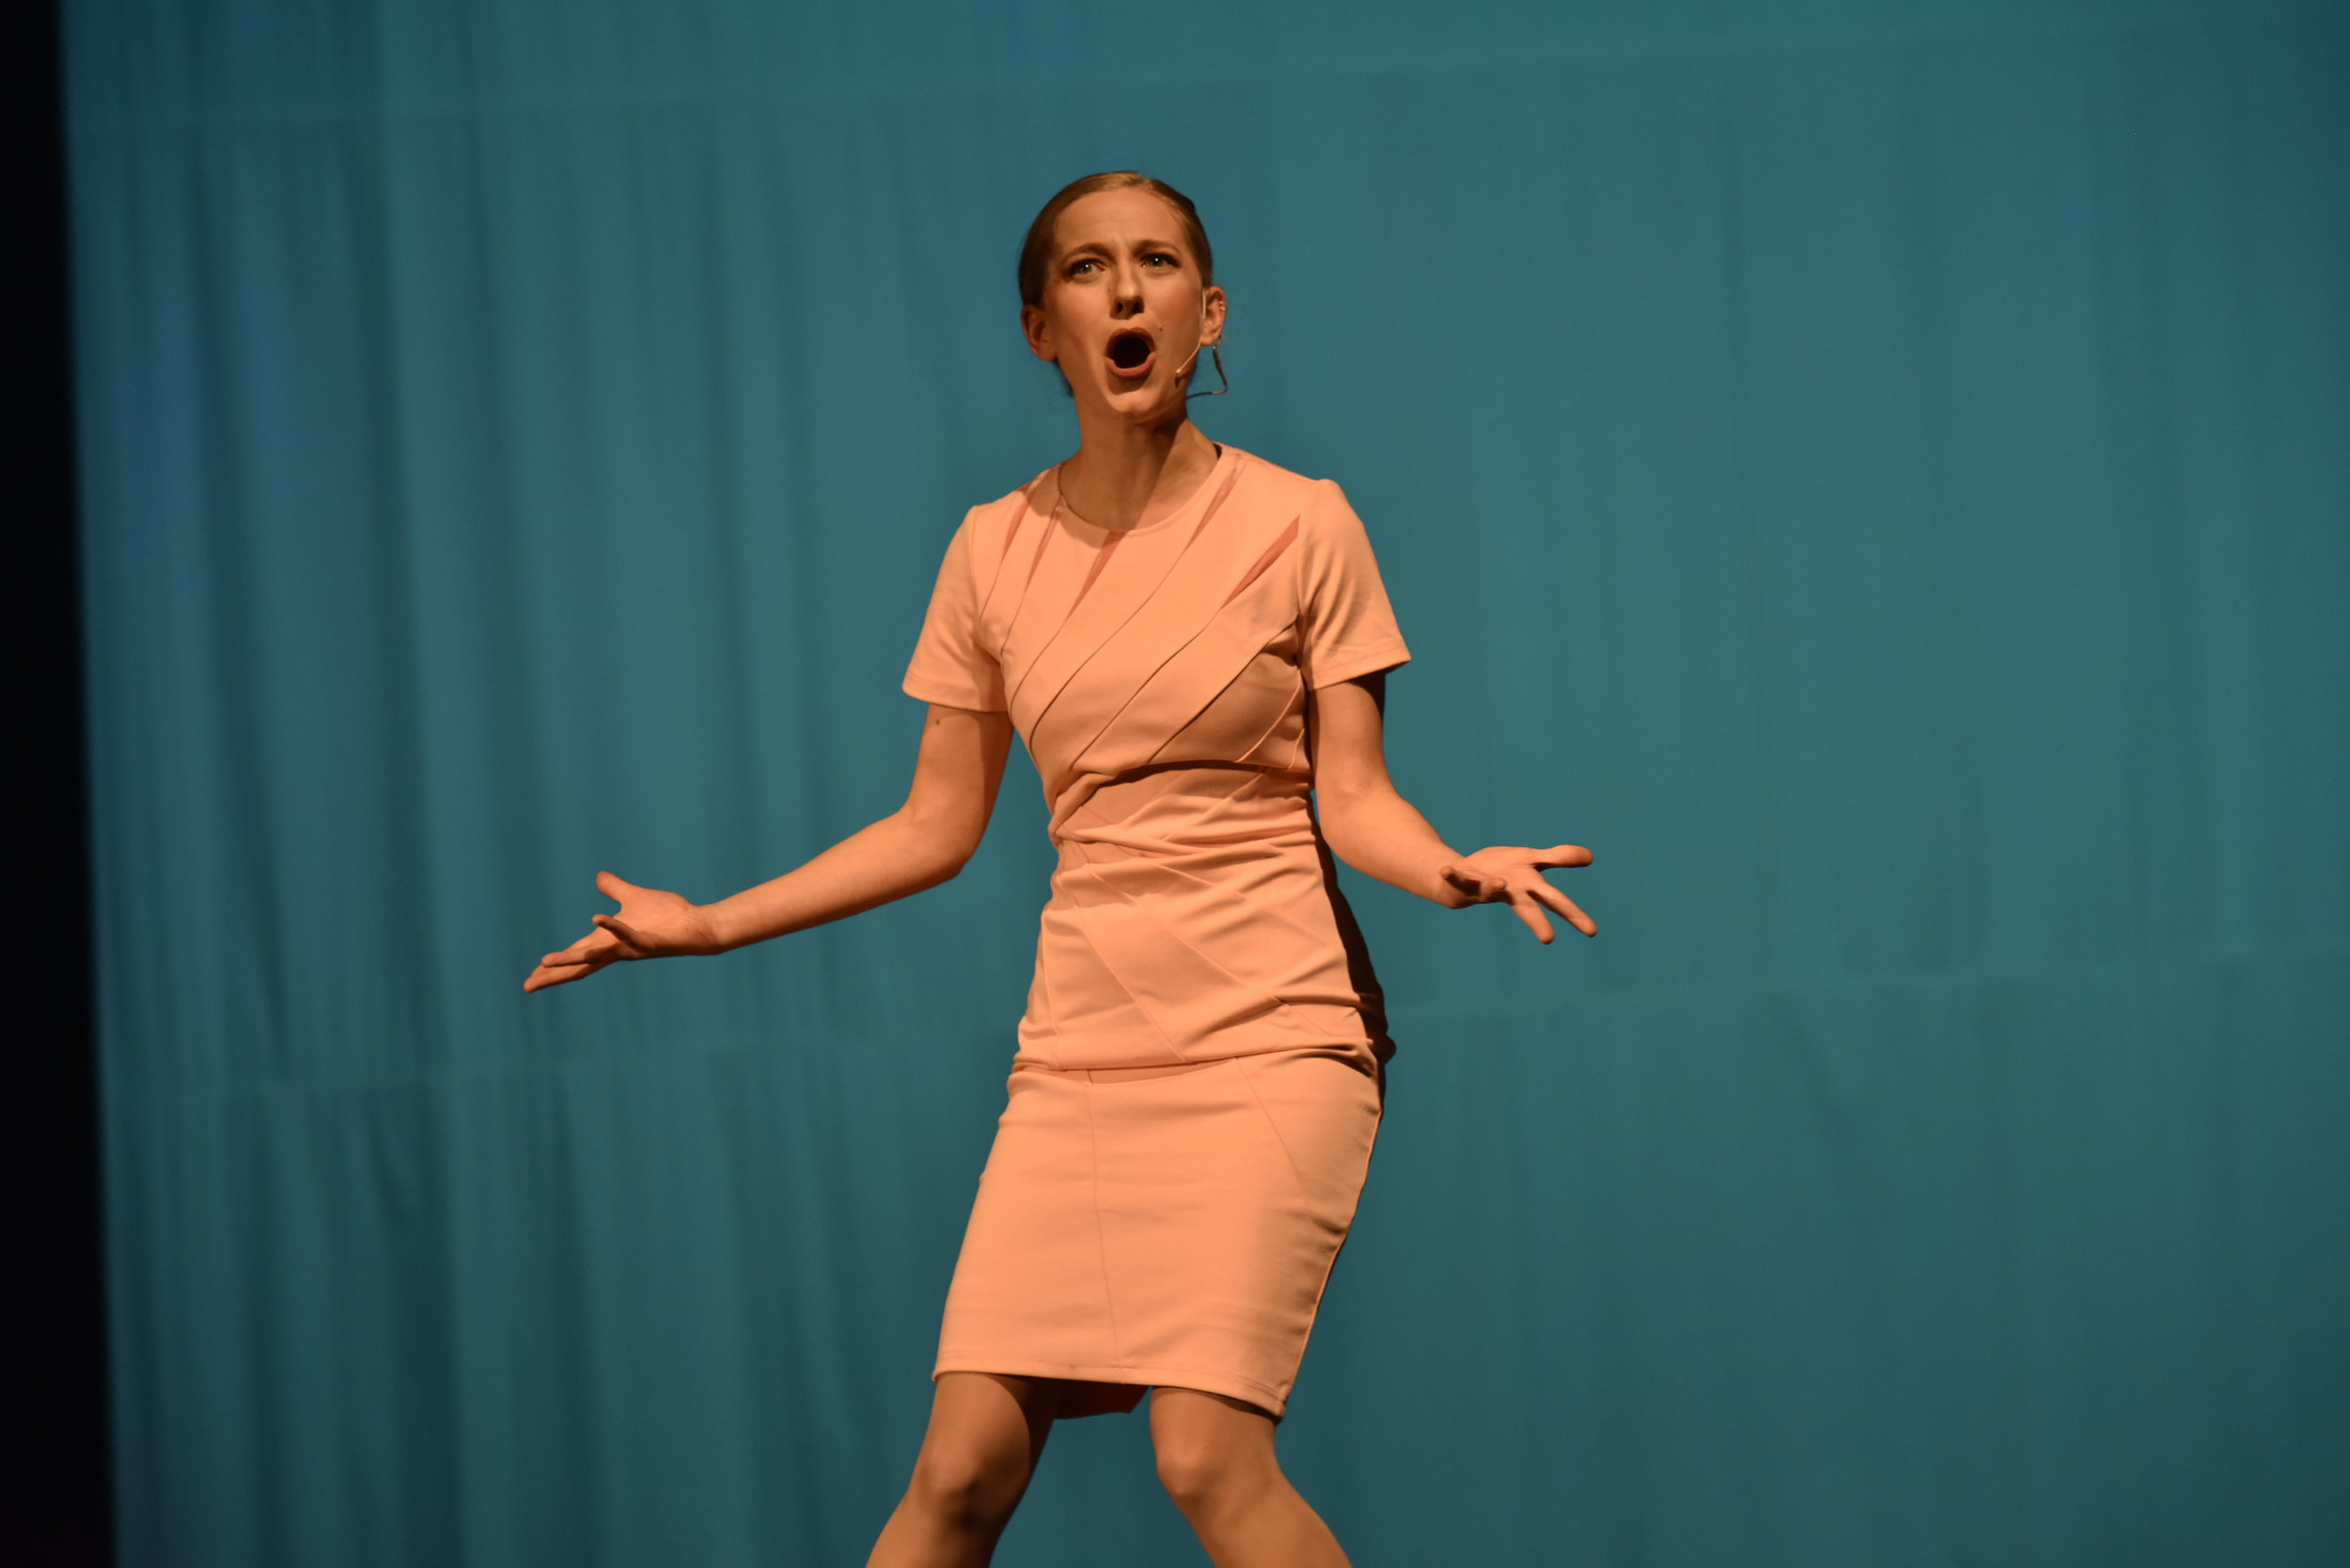 Tana Sirois as Ivanka Trump in Broad Comedy sketch